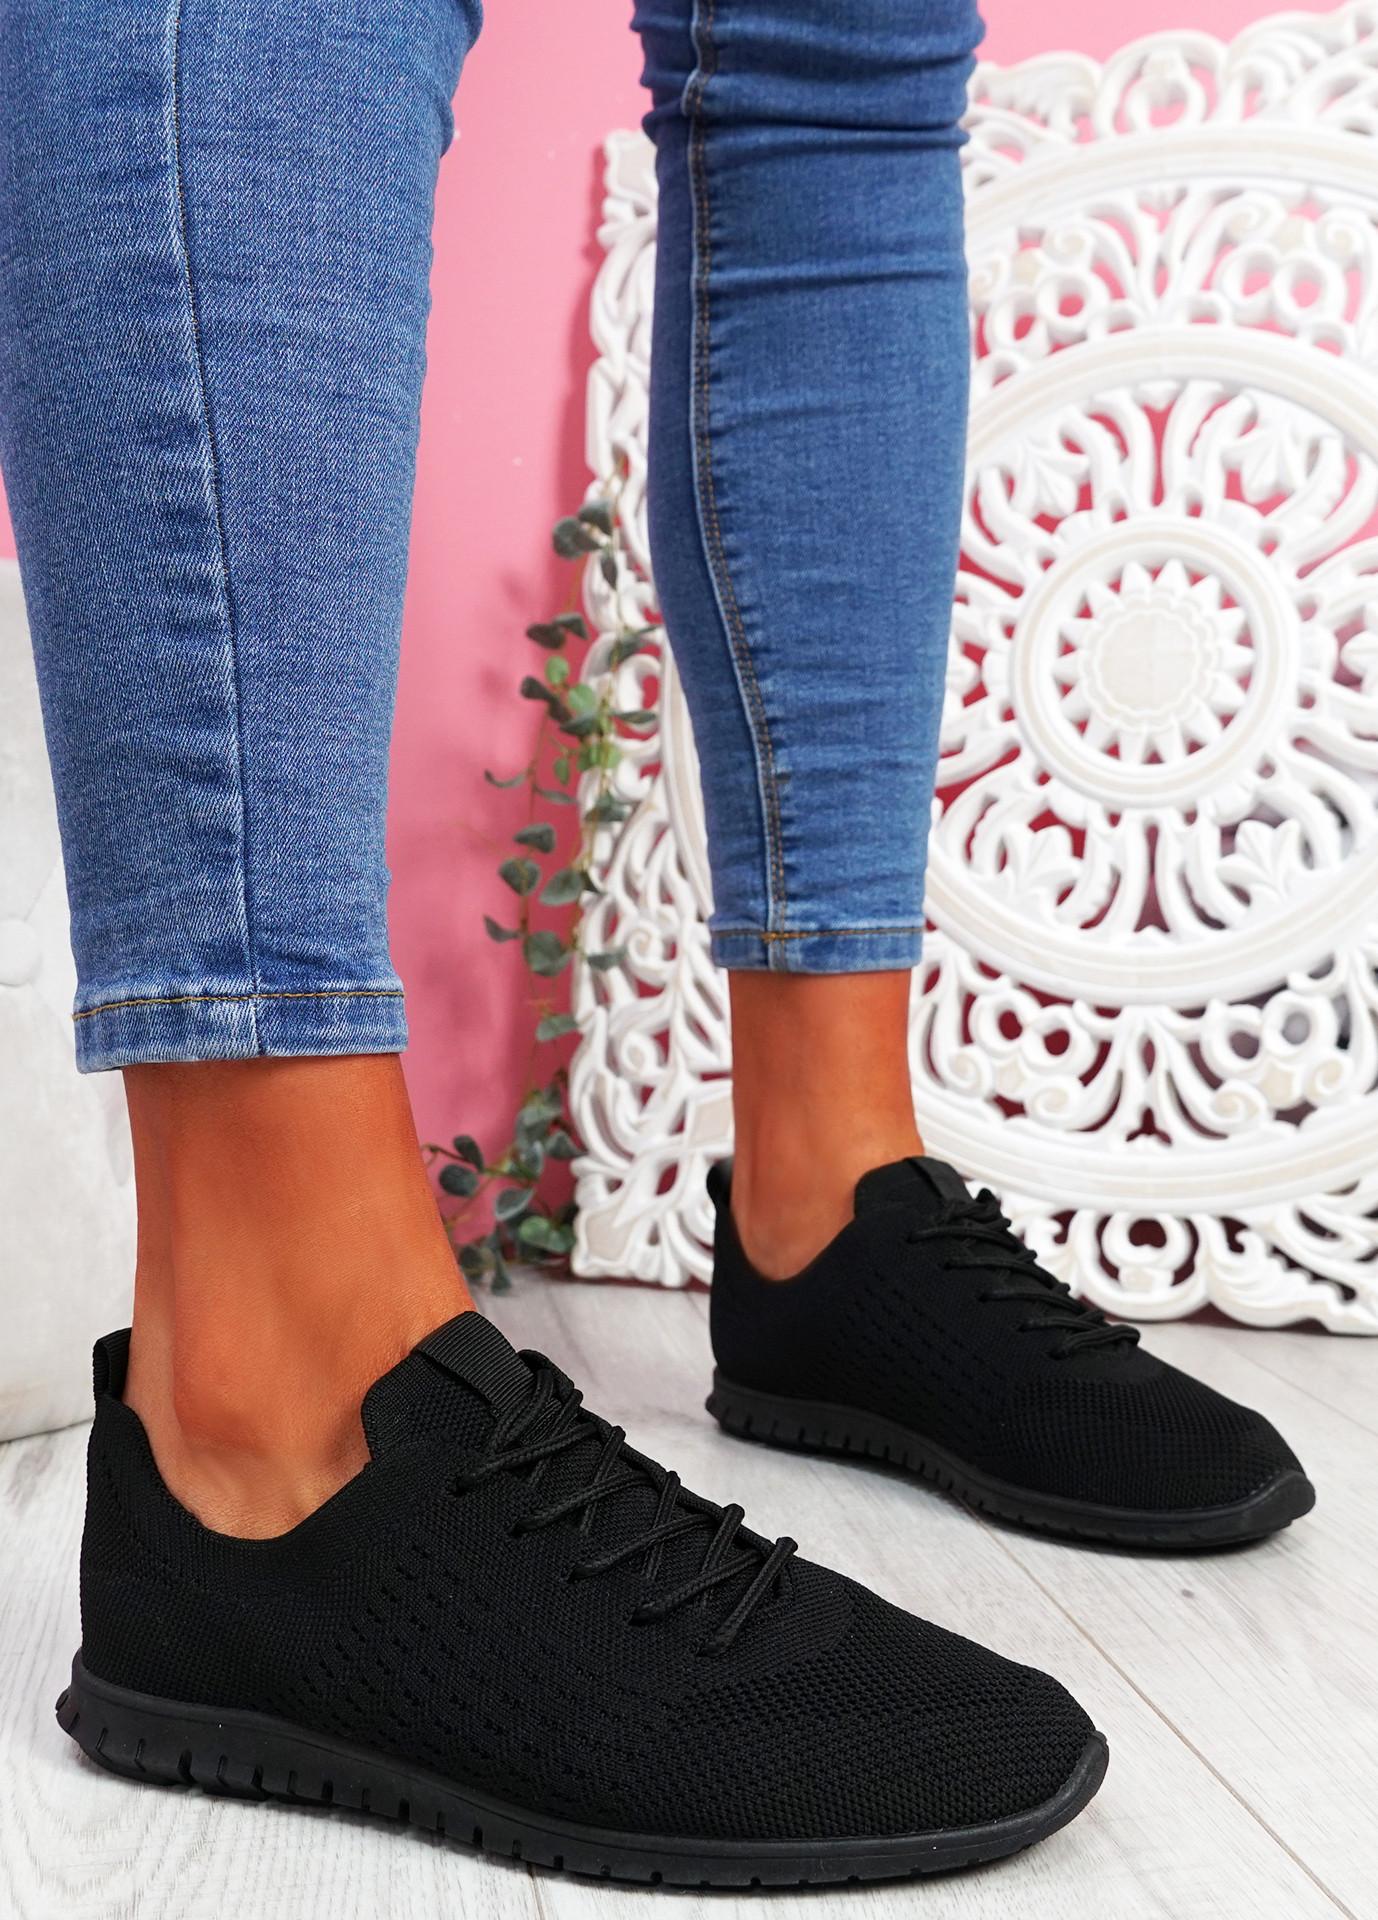 Fego Black Running Sneakers